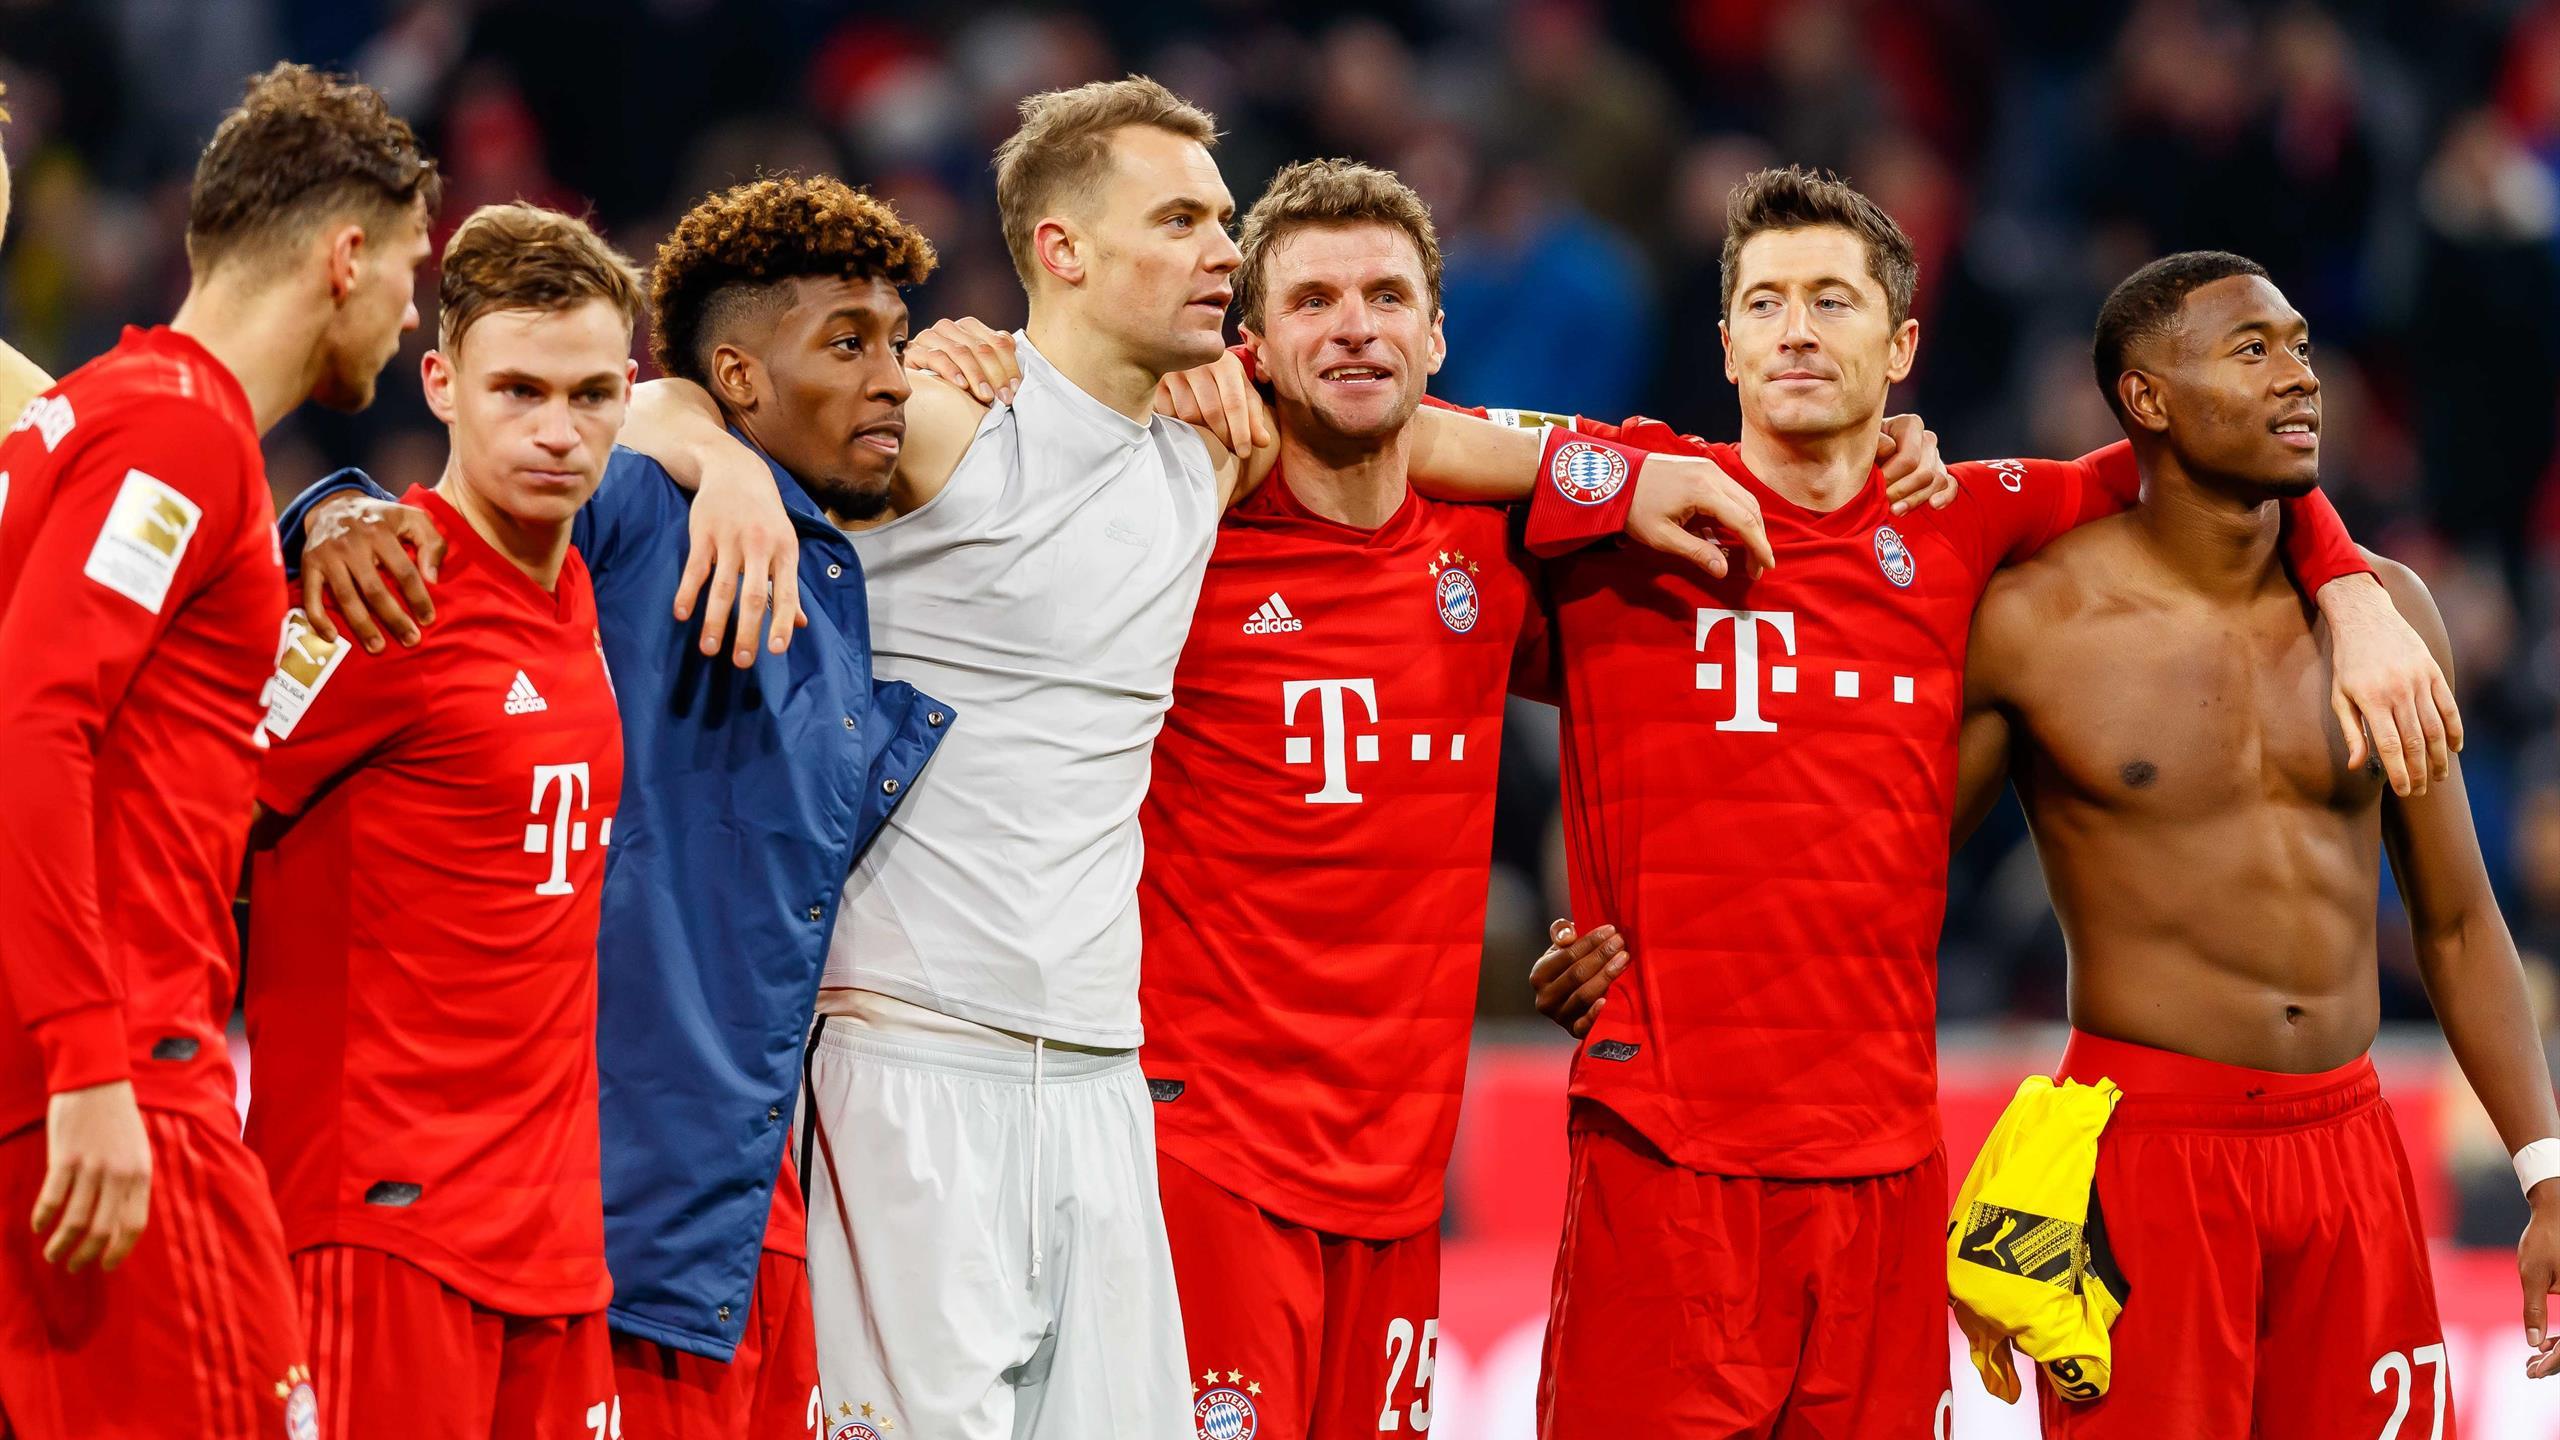 Боруссия против баварии лига чемпионов